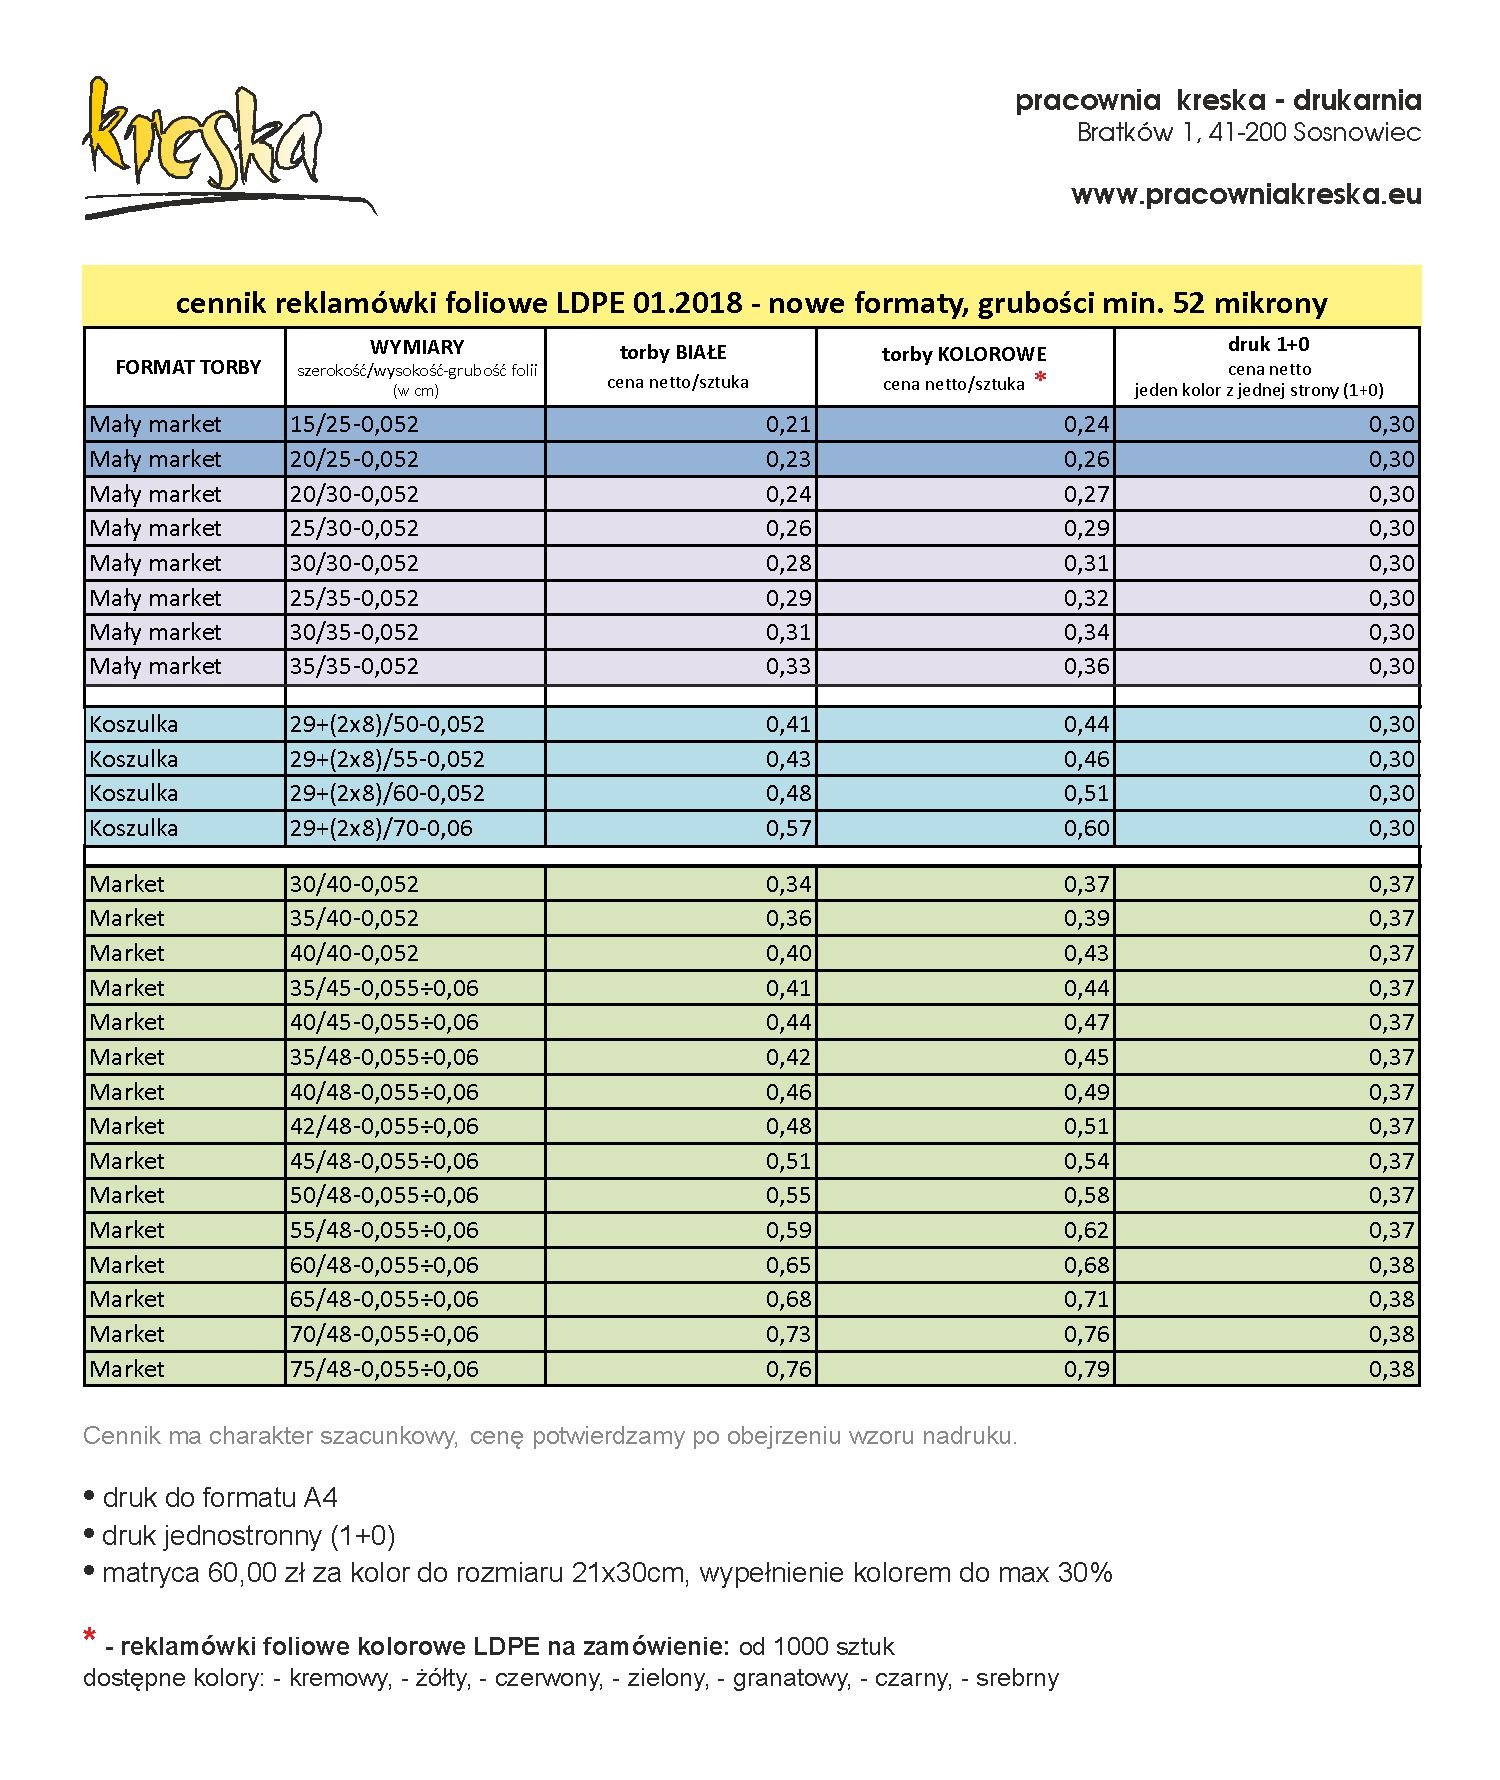 cennik reklamówki foliowe LDPE 08.2019 500-1000 sztuk, pracownia kreska - drukarnia